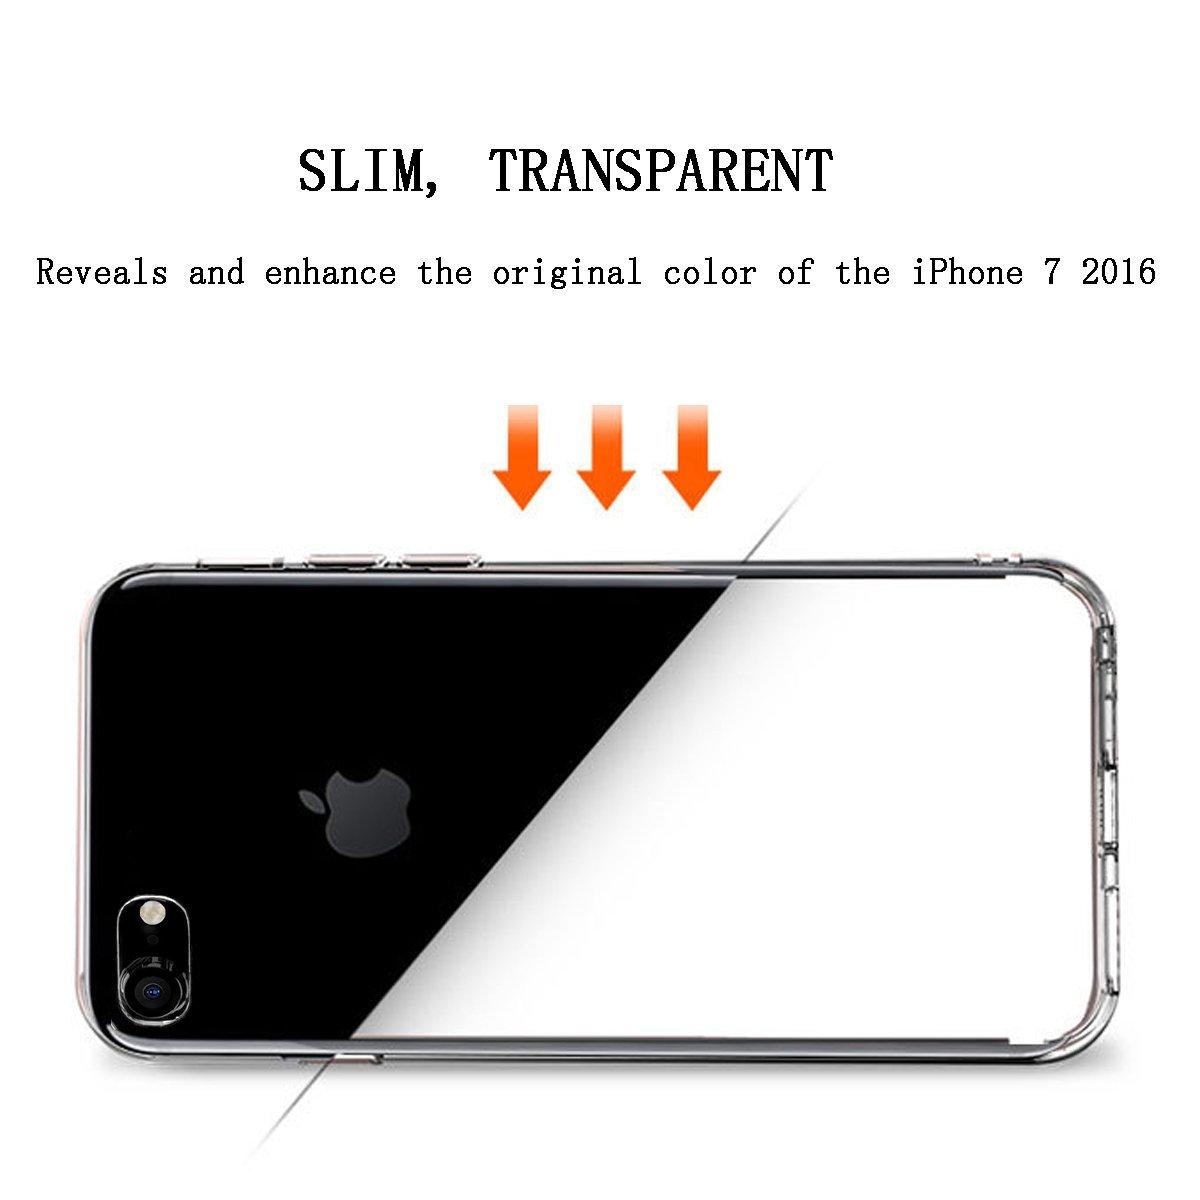 iphone 7 iphone 7 plus pruhledny ciry transparentni obal kryt slim pouzdro silikonovy slilikonove